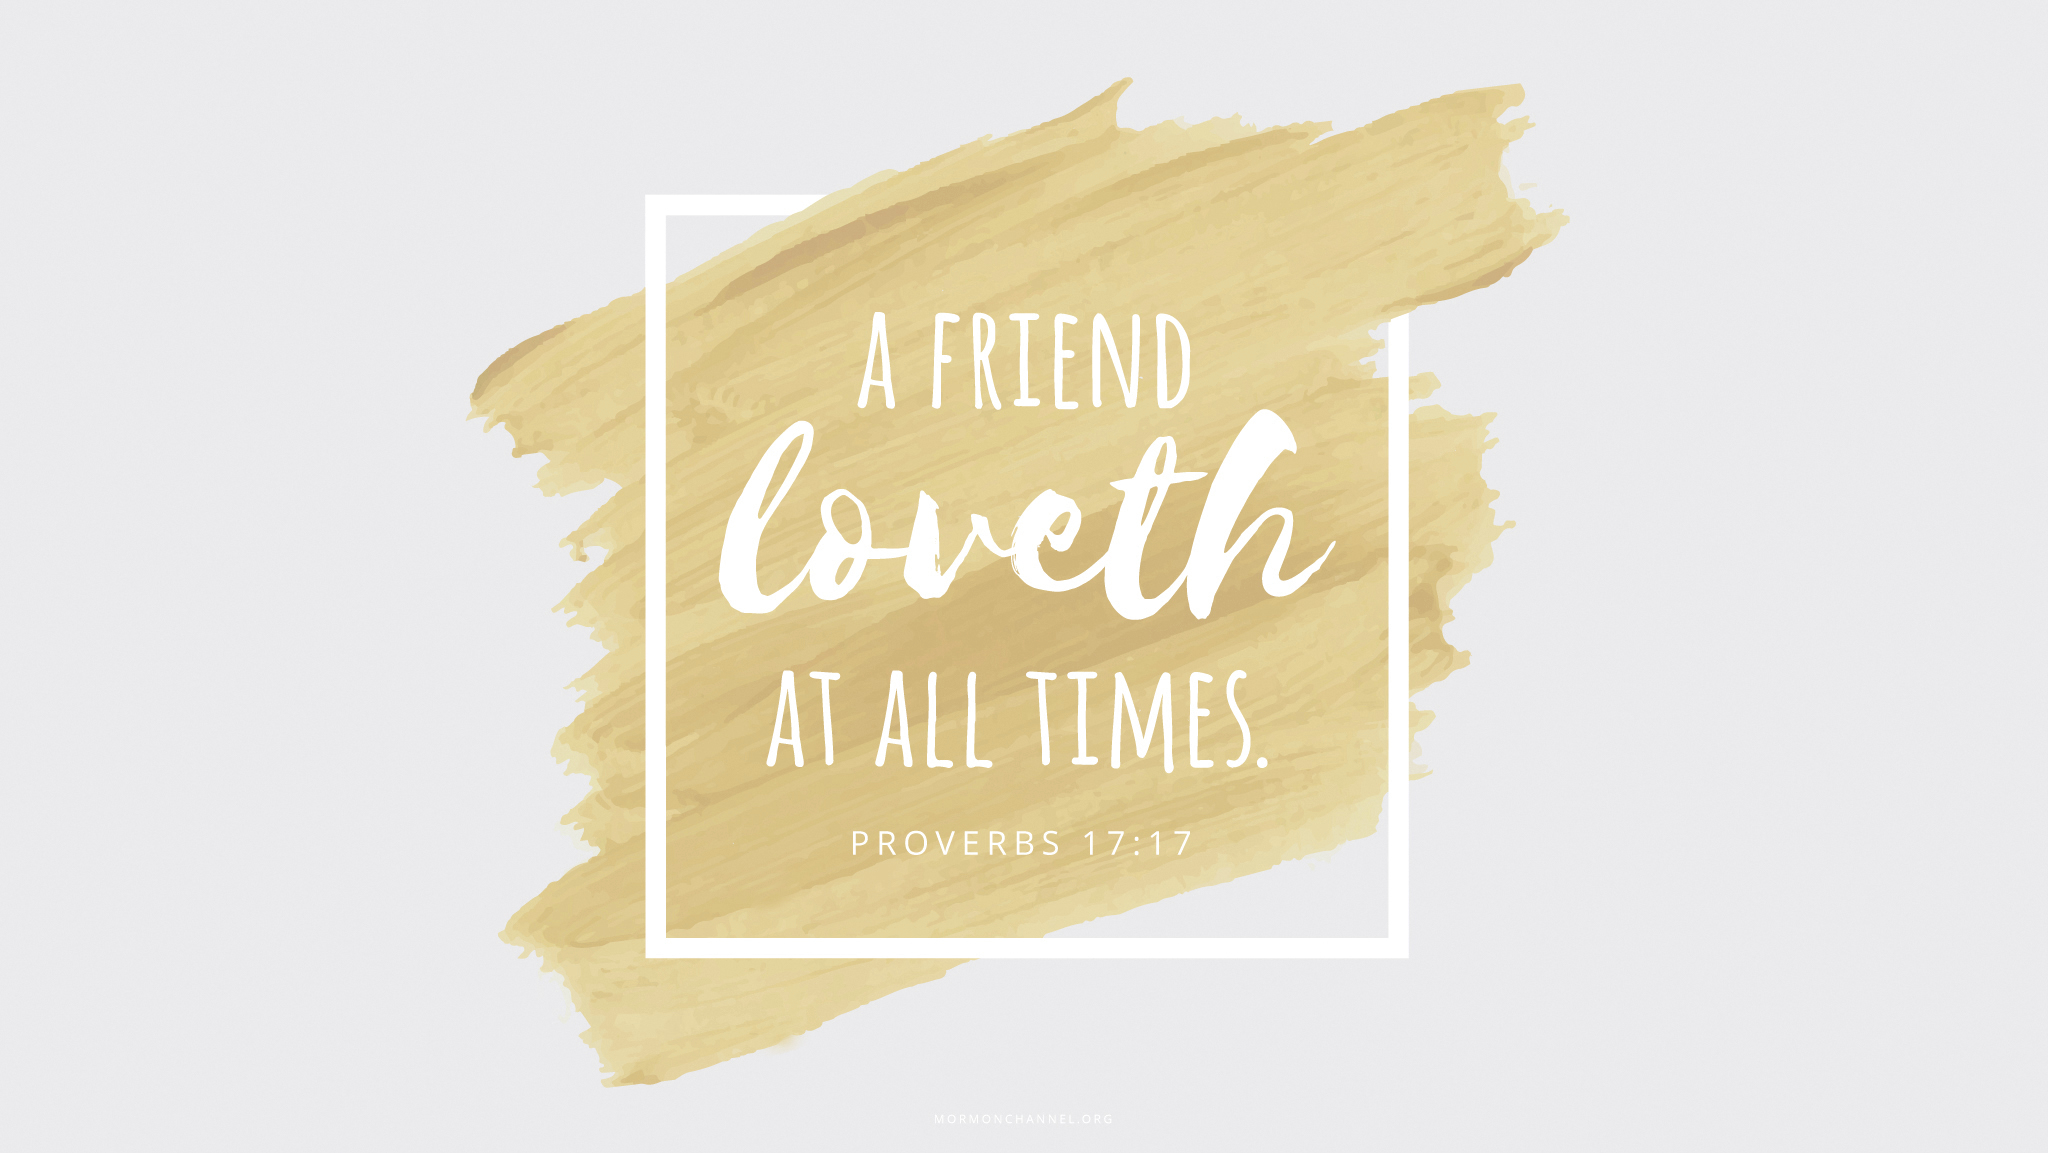 """A friend loveth at all times.""—Proverbs 17:17"